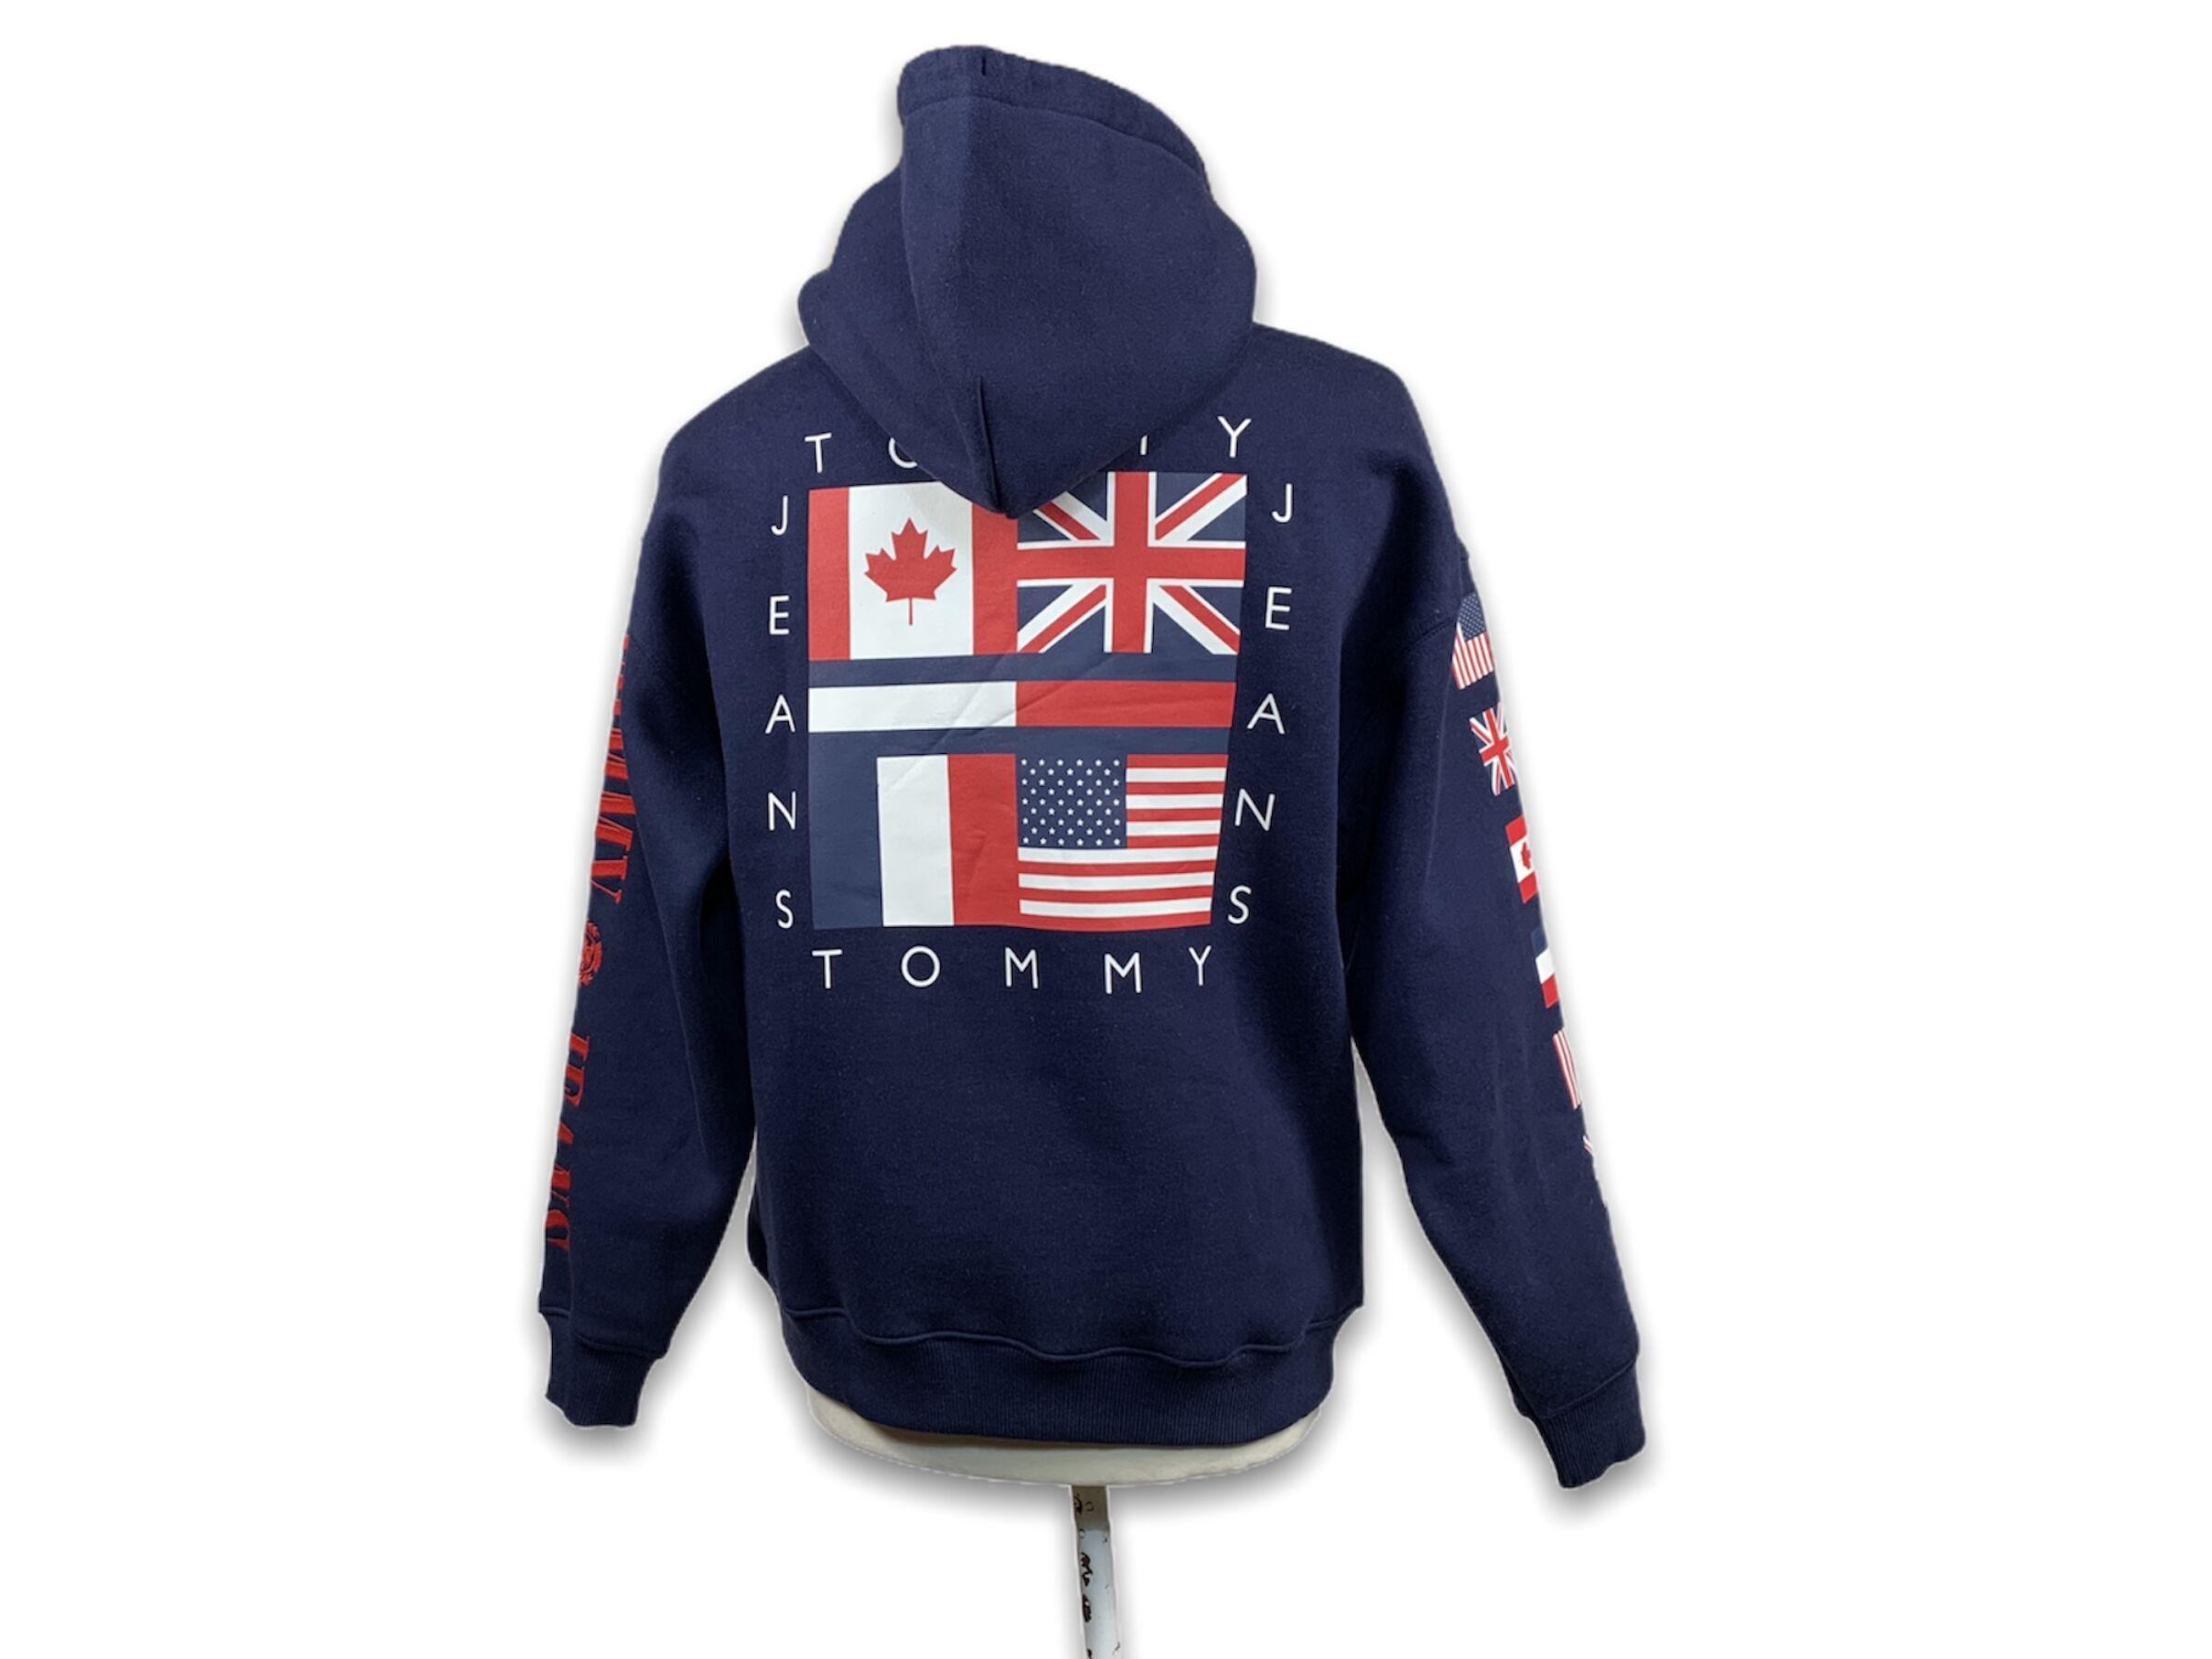 Tommy Jeans pulóver (L)